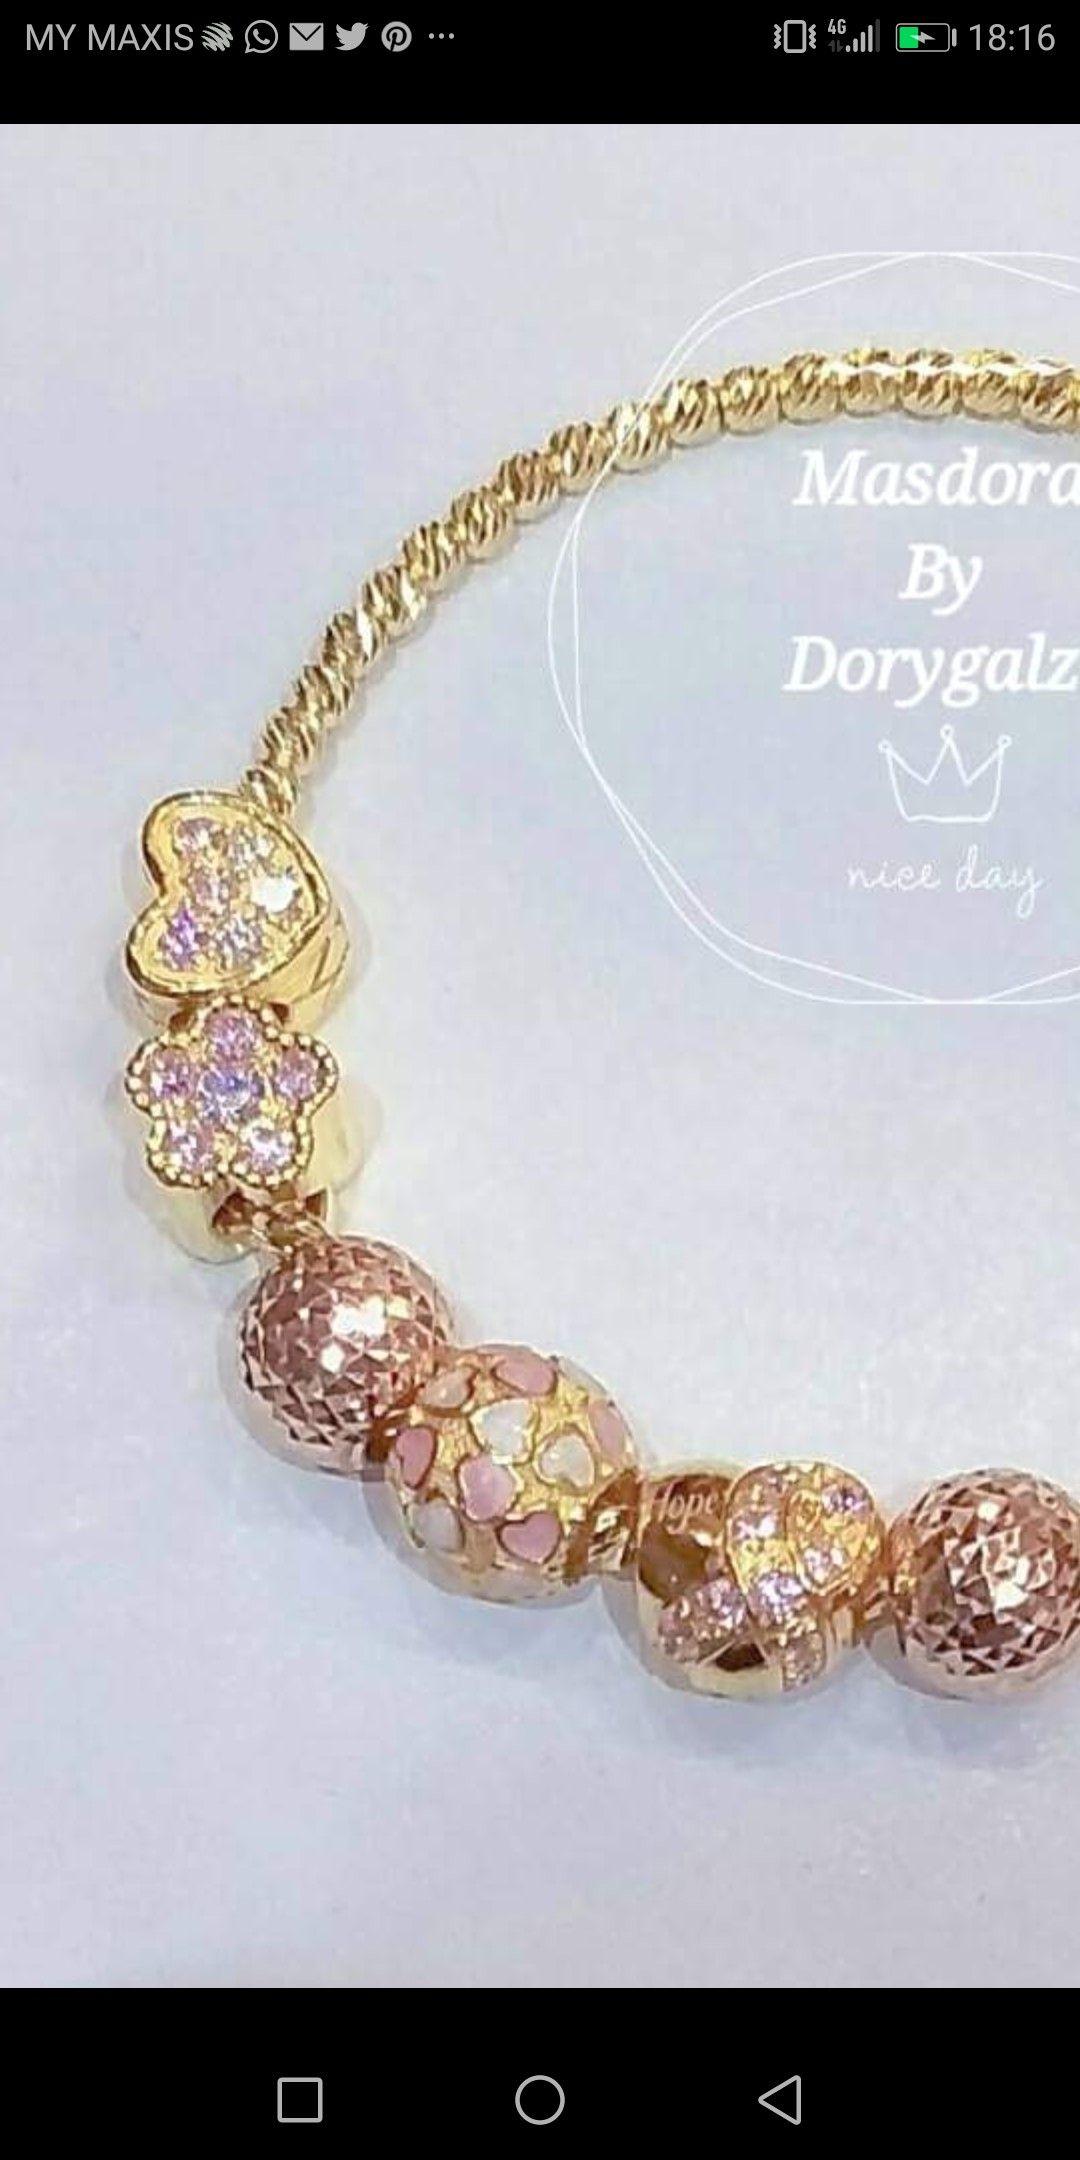 7ab18e764 ... GOLD 916 Bracelet by Annaraisya. Tags. Pandora Charms · Pandora Charms